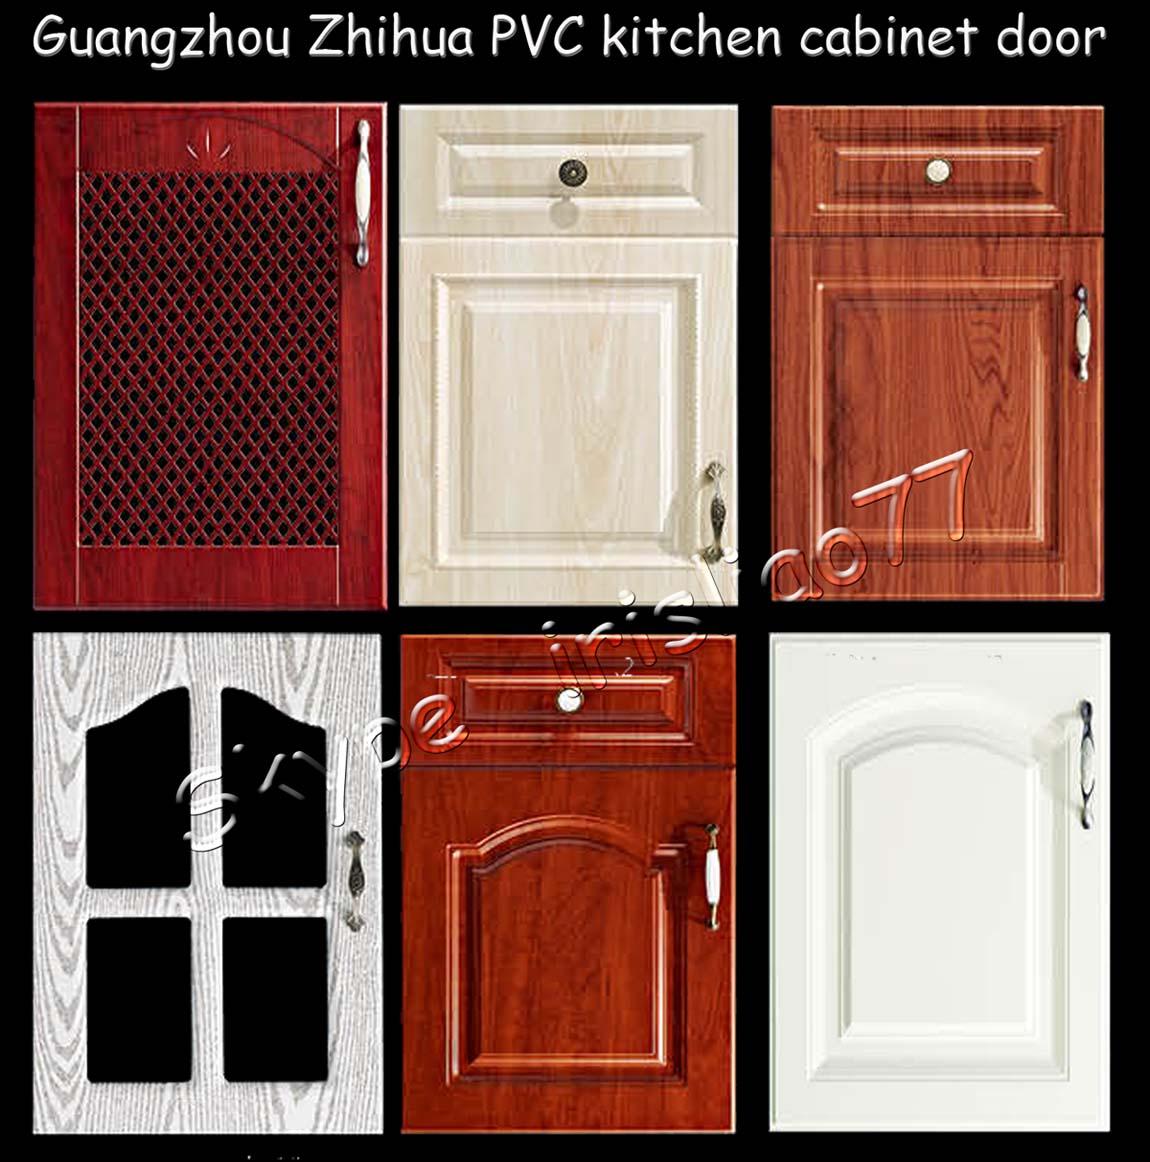 pvc laminate kitchen cabinet door price view pvc kitchen cabinet door